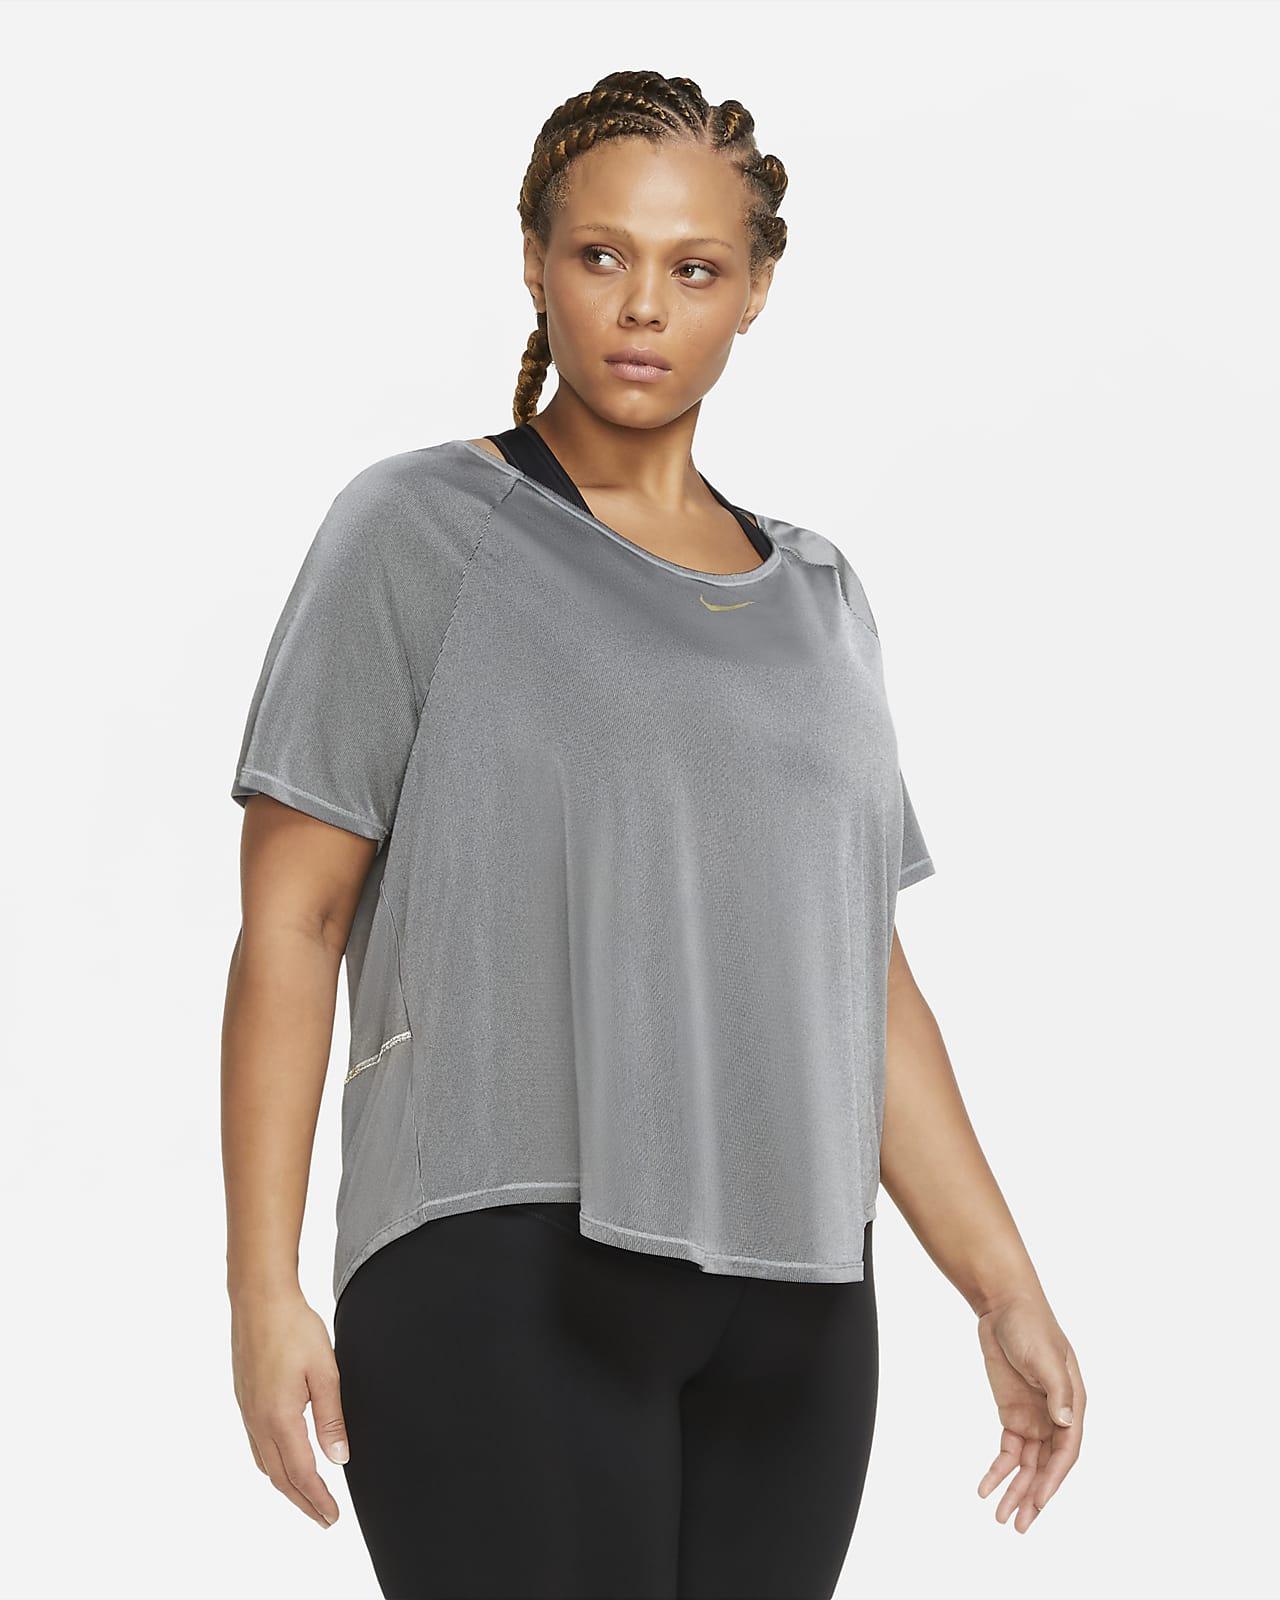 Nike Icon Clash Women's Short-Sleeve Running Top (Plus size)